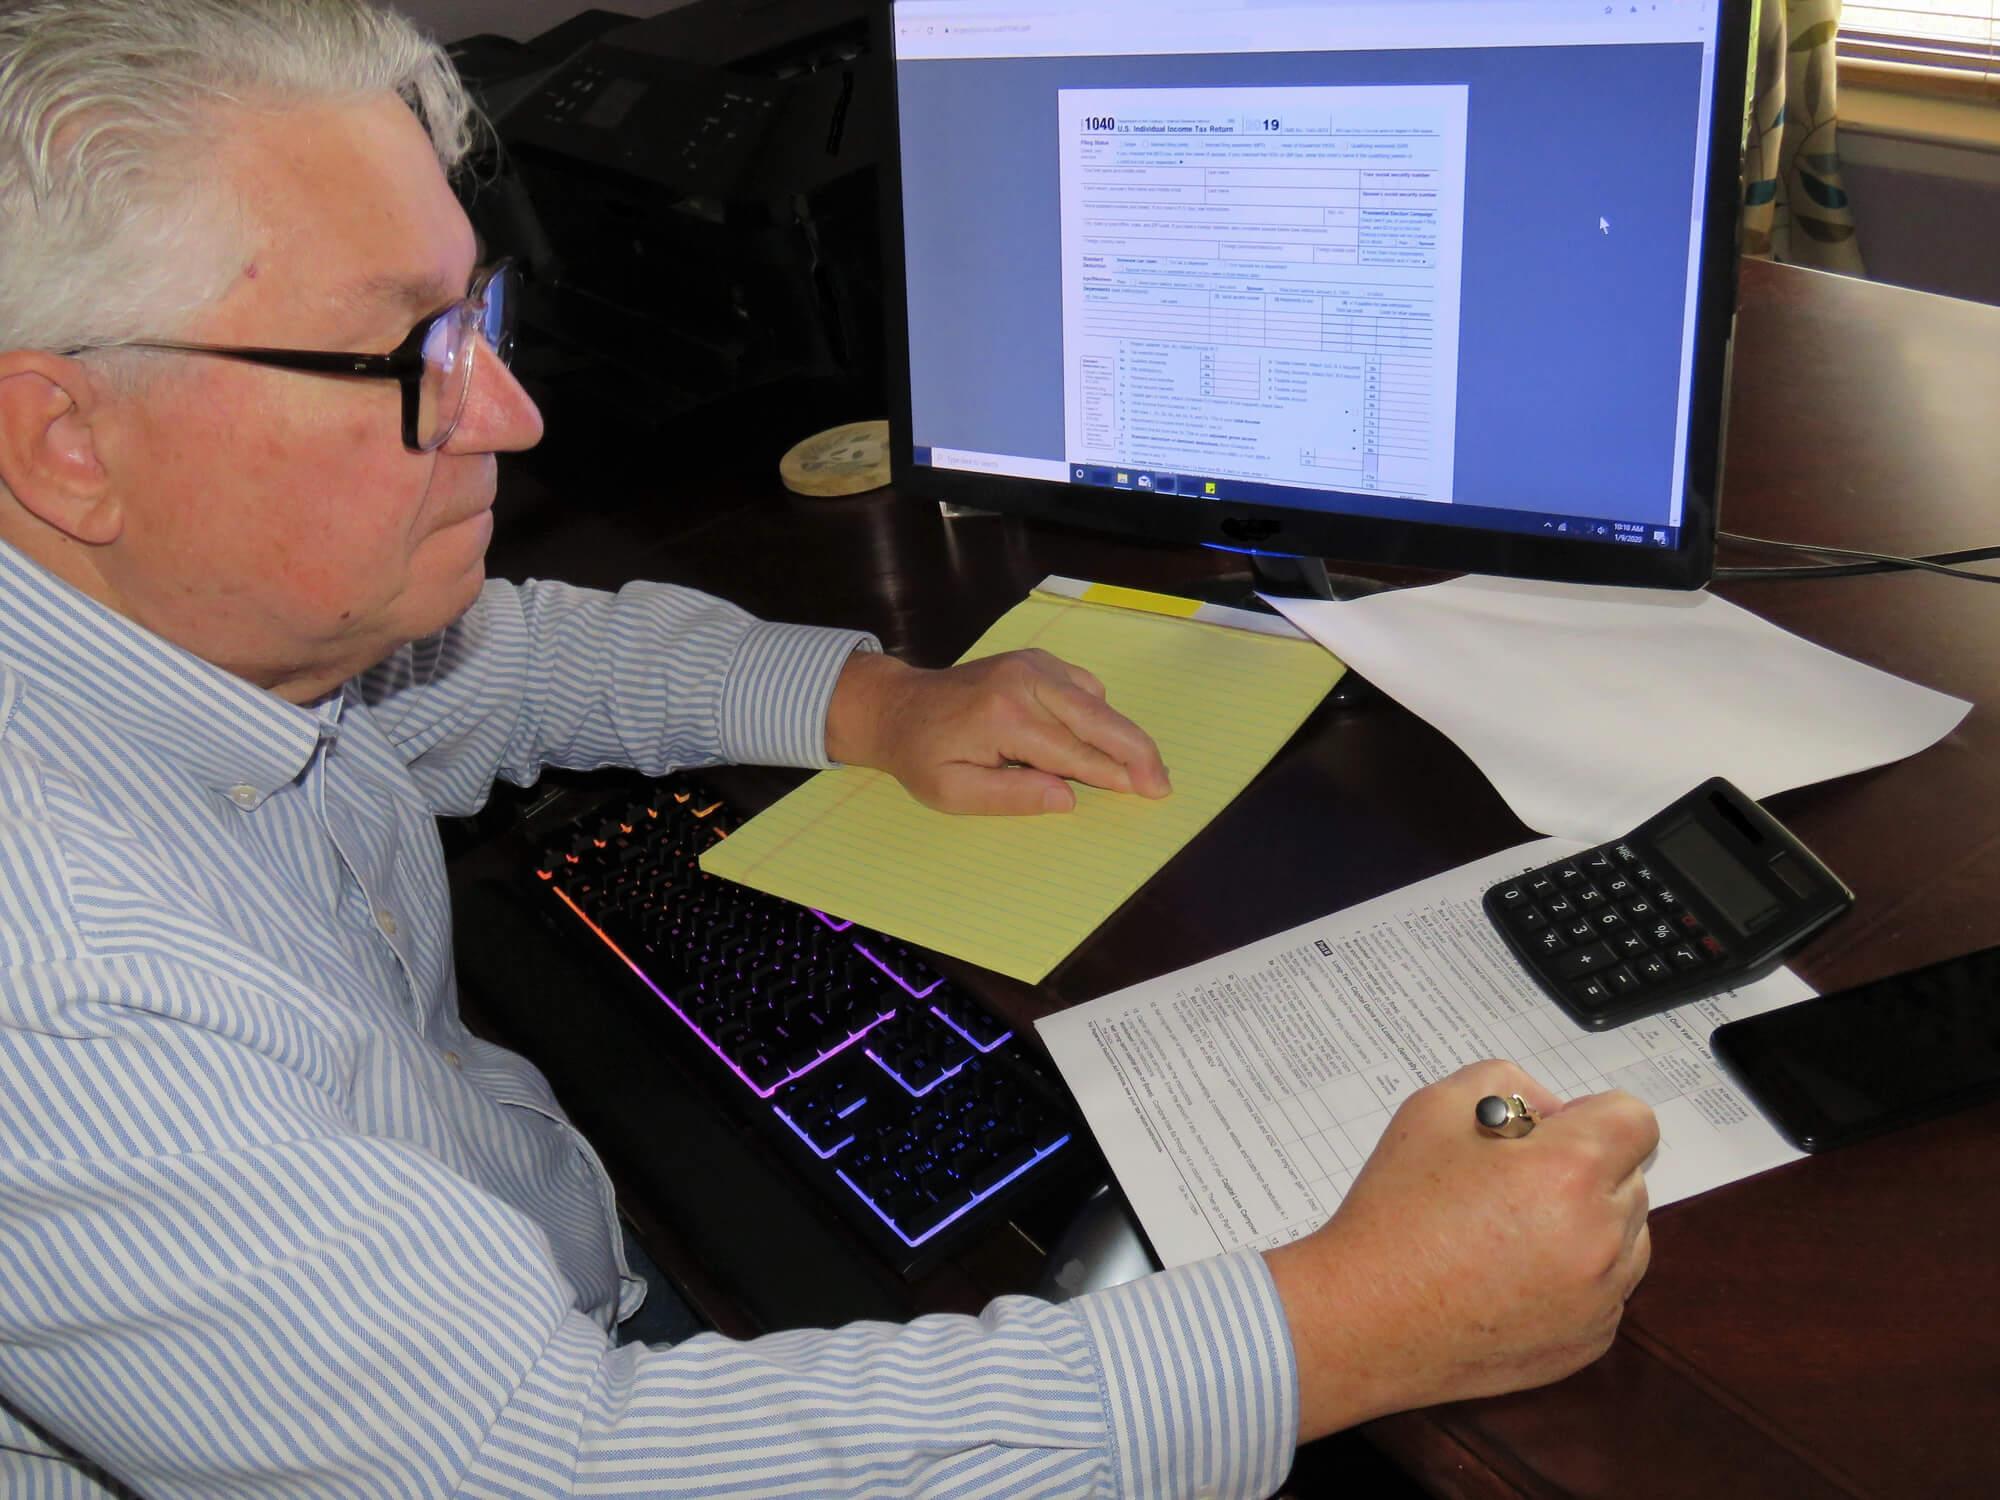 Professional Tax Preparer - Complete Controller